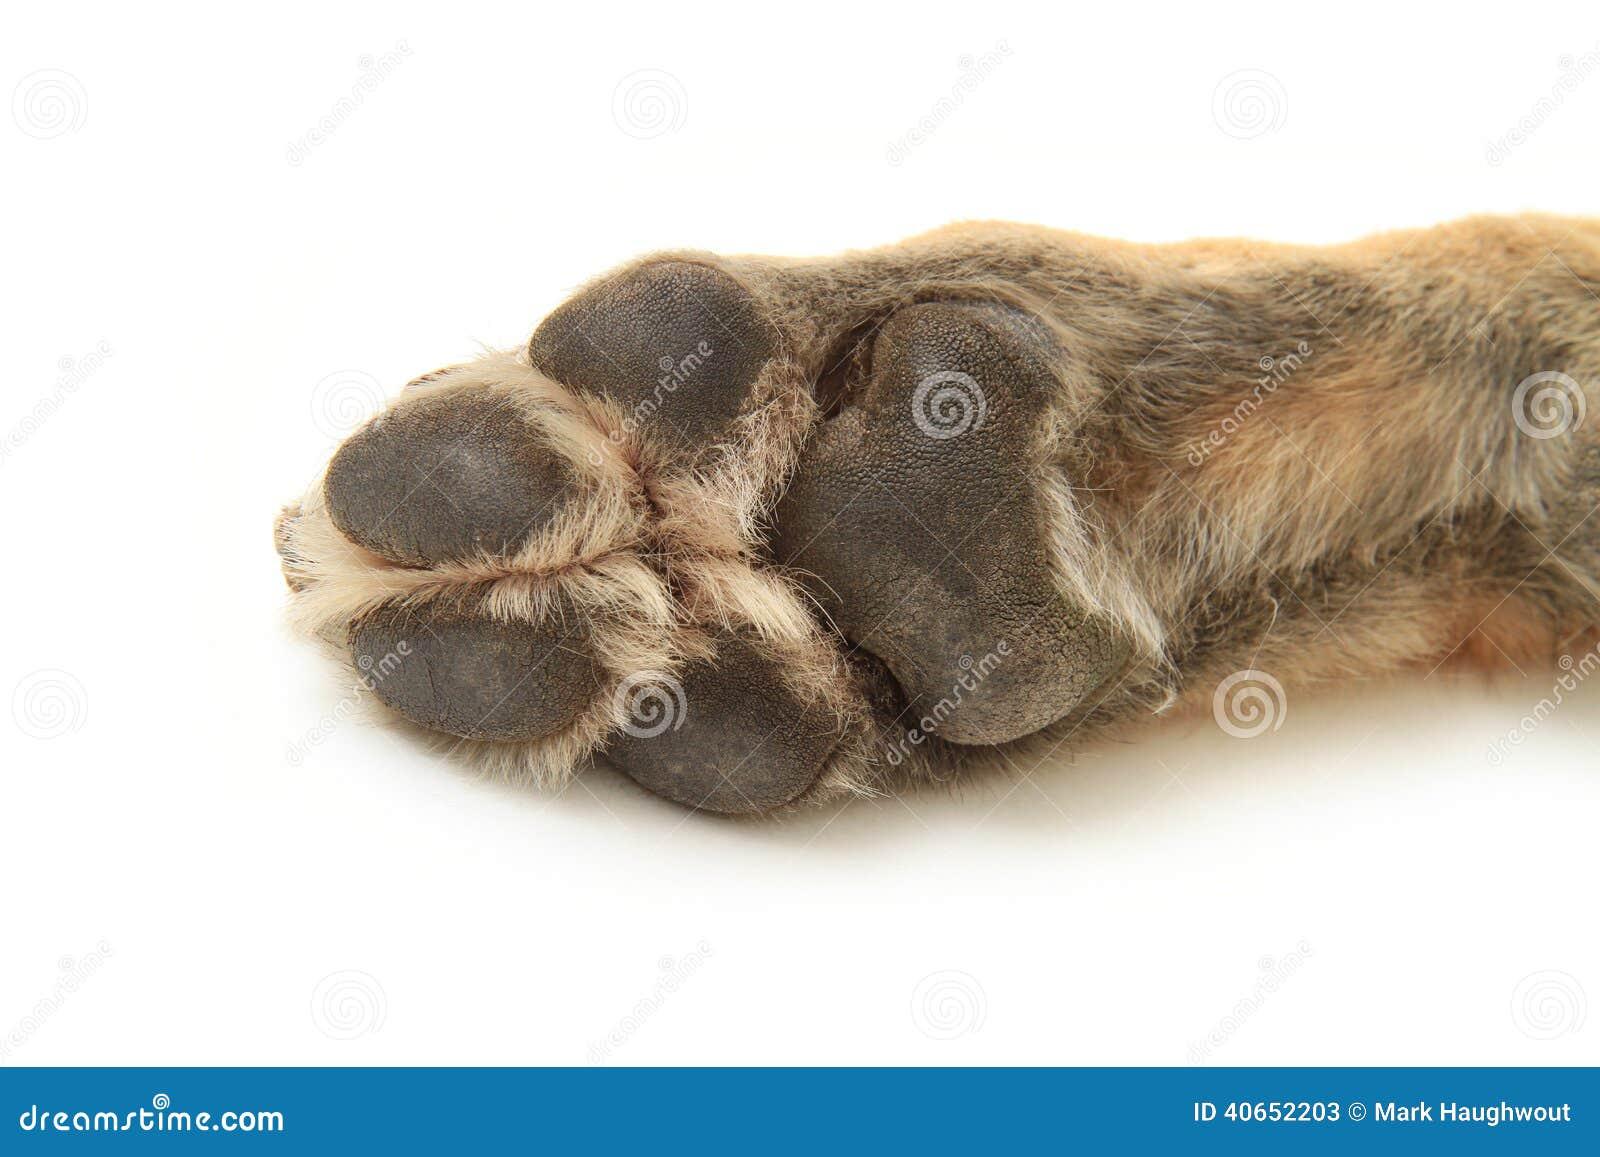 German Shepherd dog paw upside down on a white background.